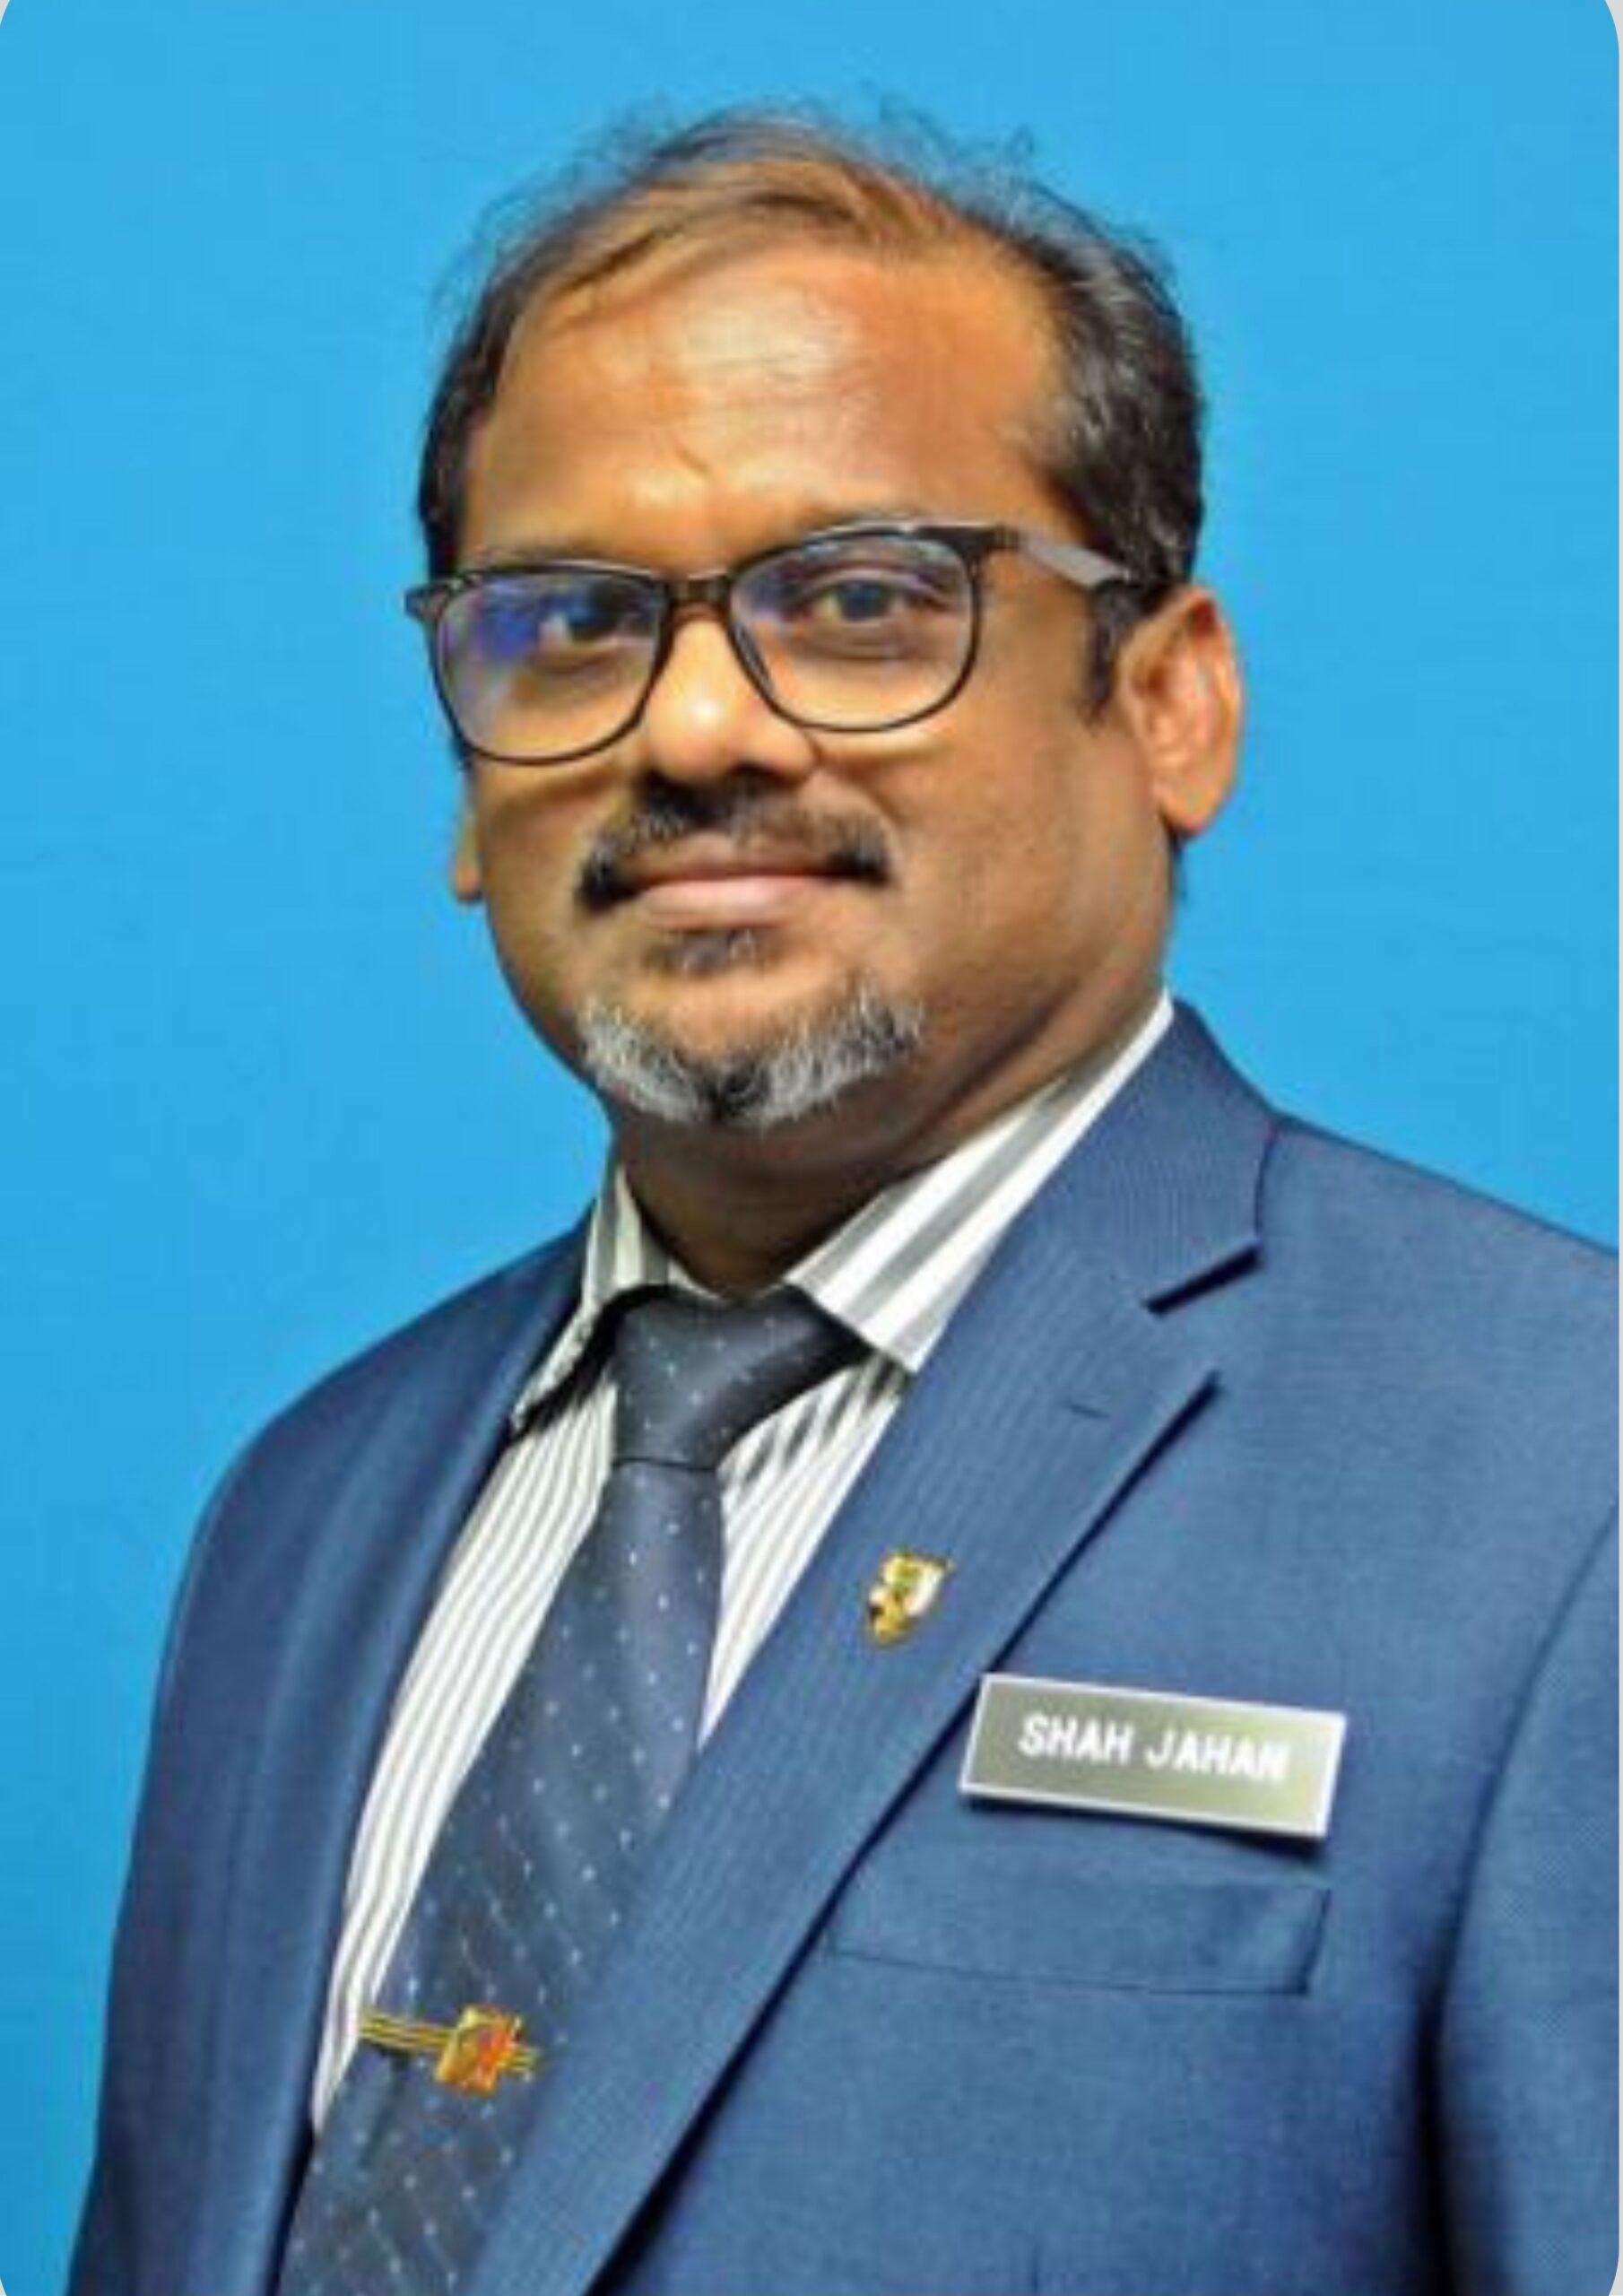 Dr. Shah Jahan Bin Assanarkutty